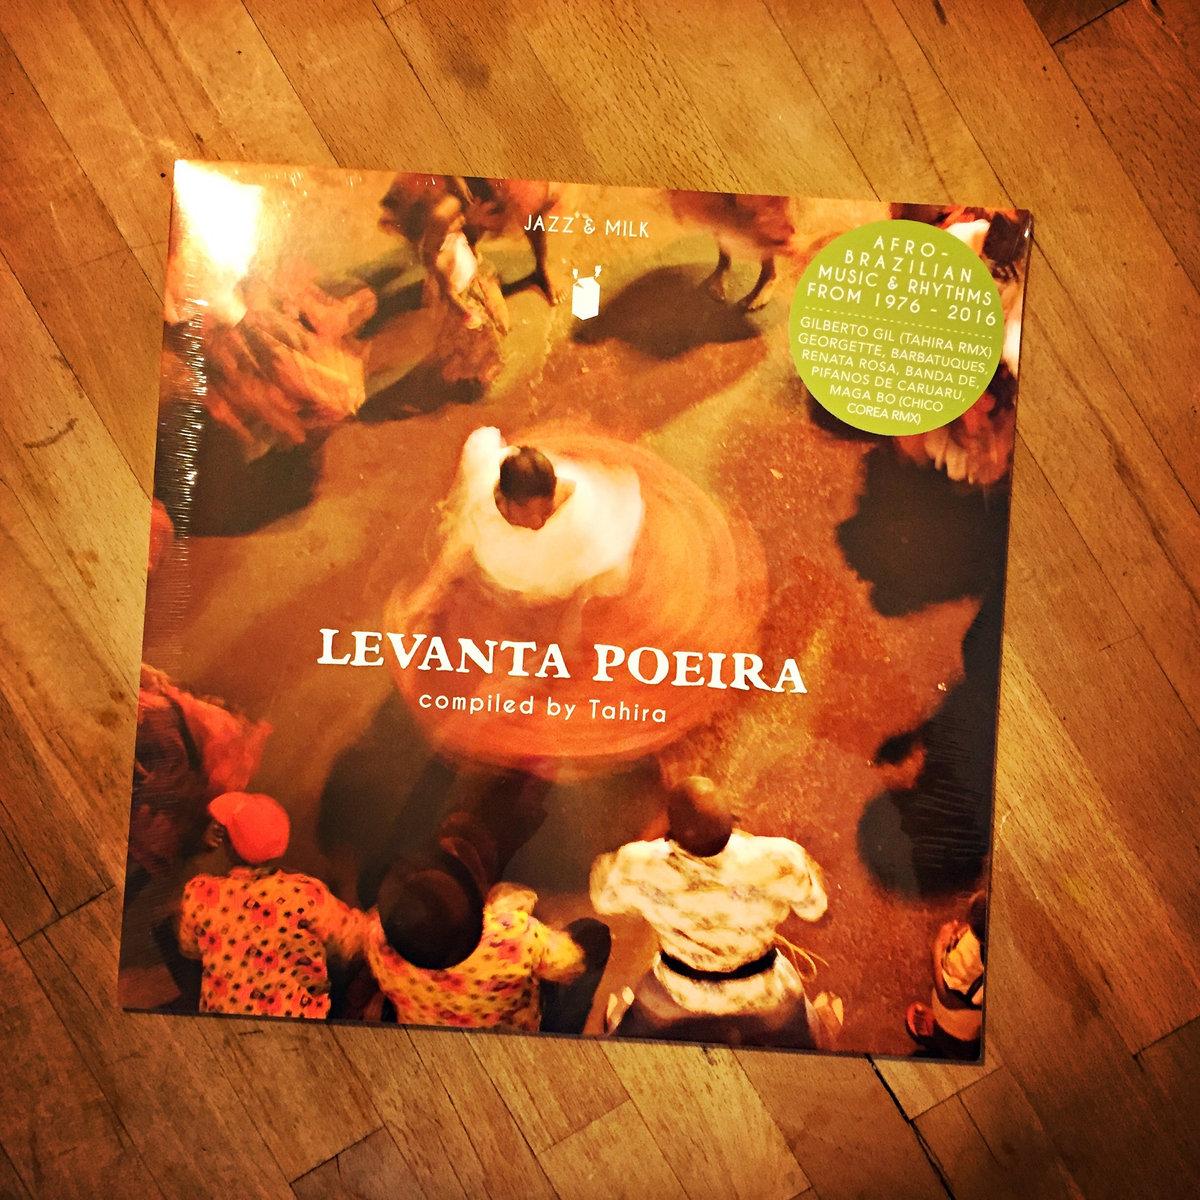 Levanta Poeira - Afro-Brazilian music & rhythms from 1976